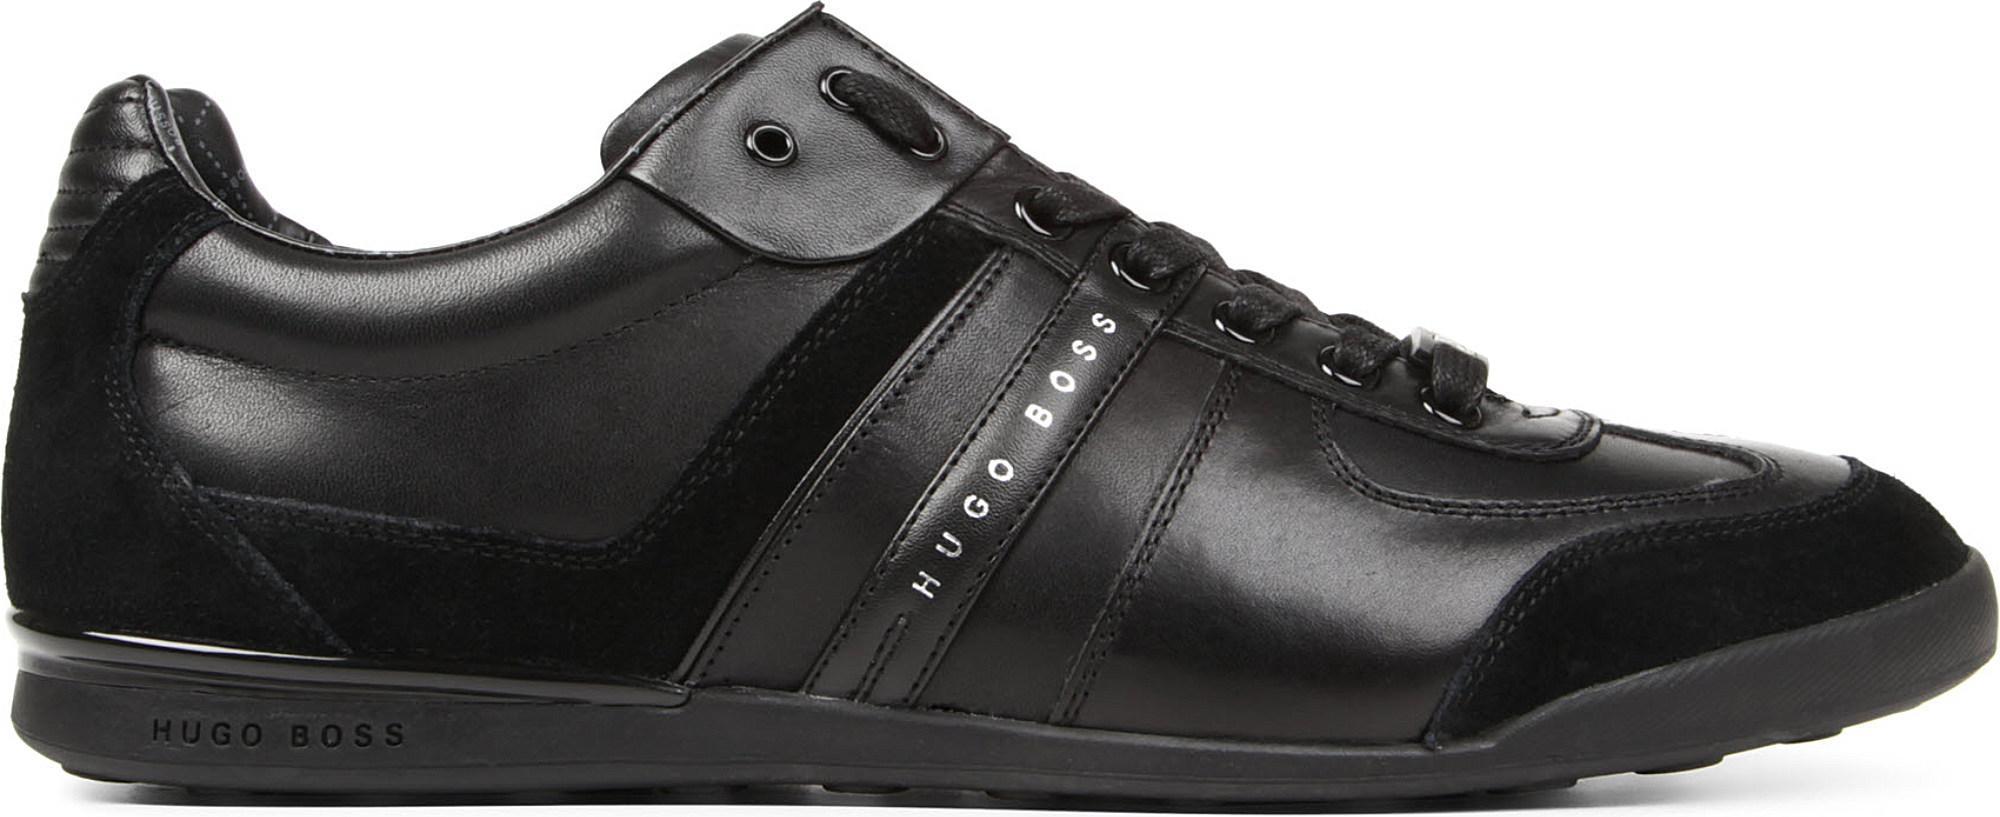 Hugo Boss Hugo Aki Leather Trainers